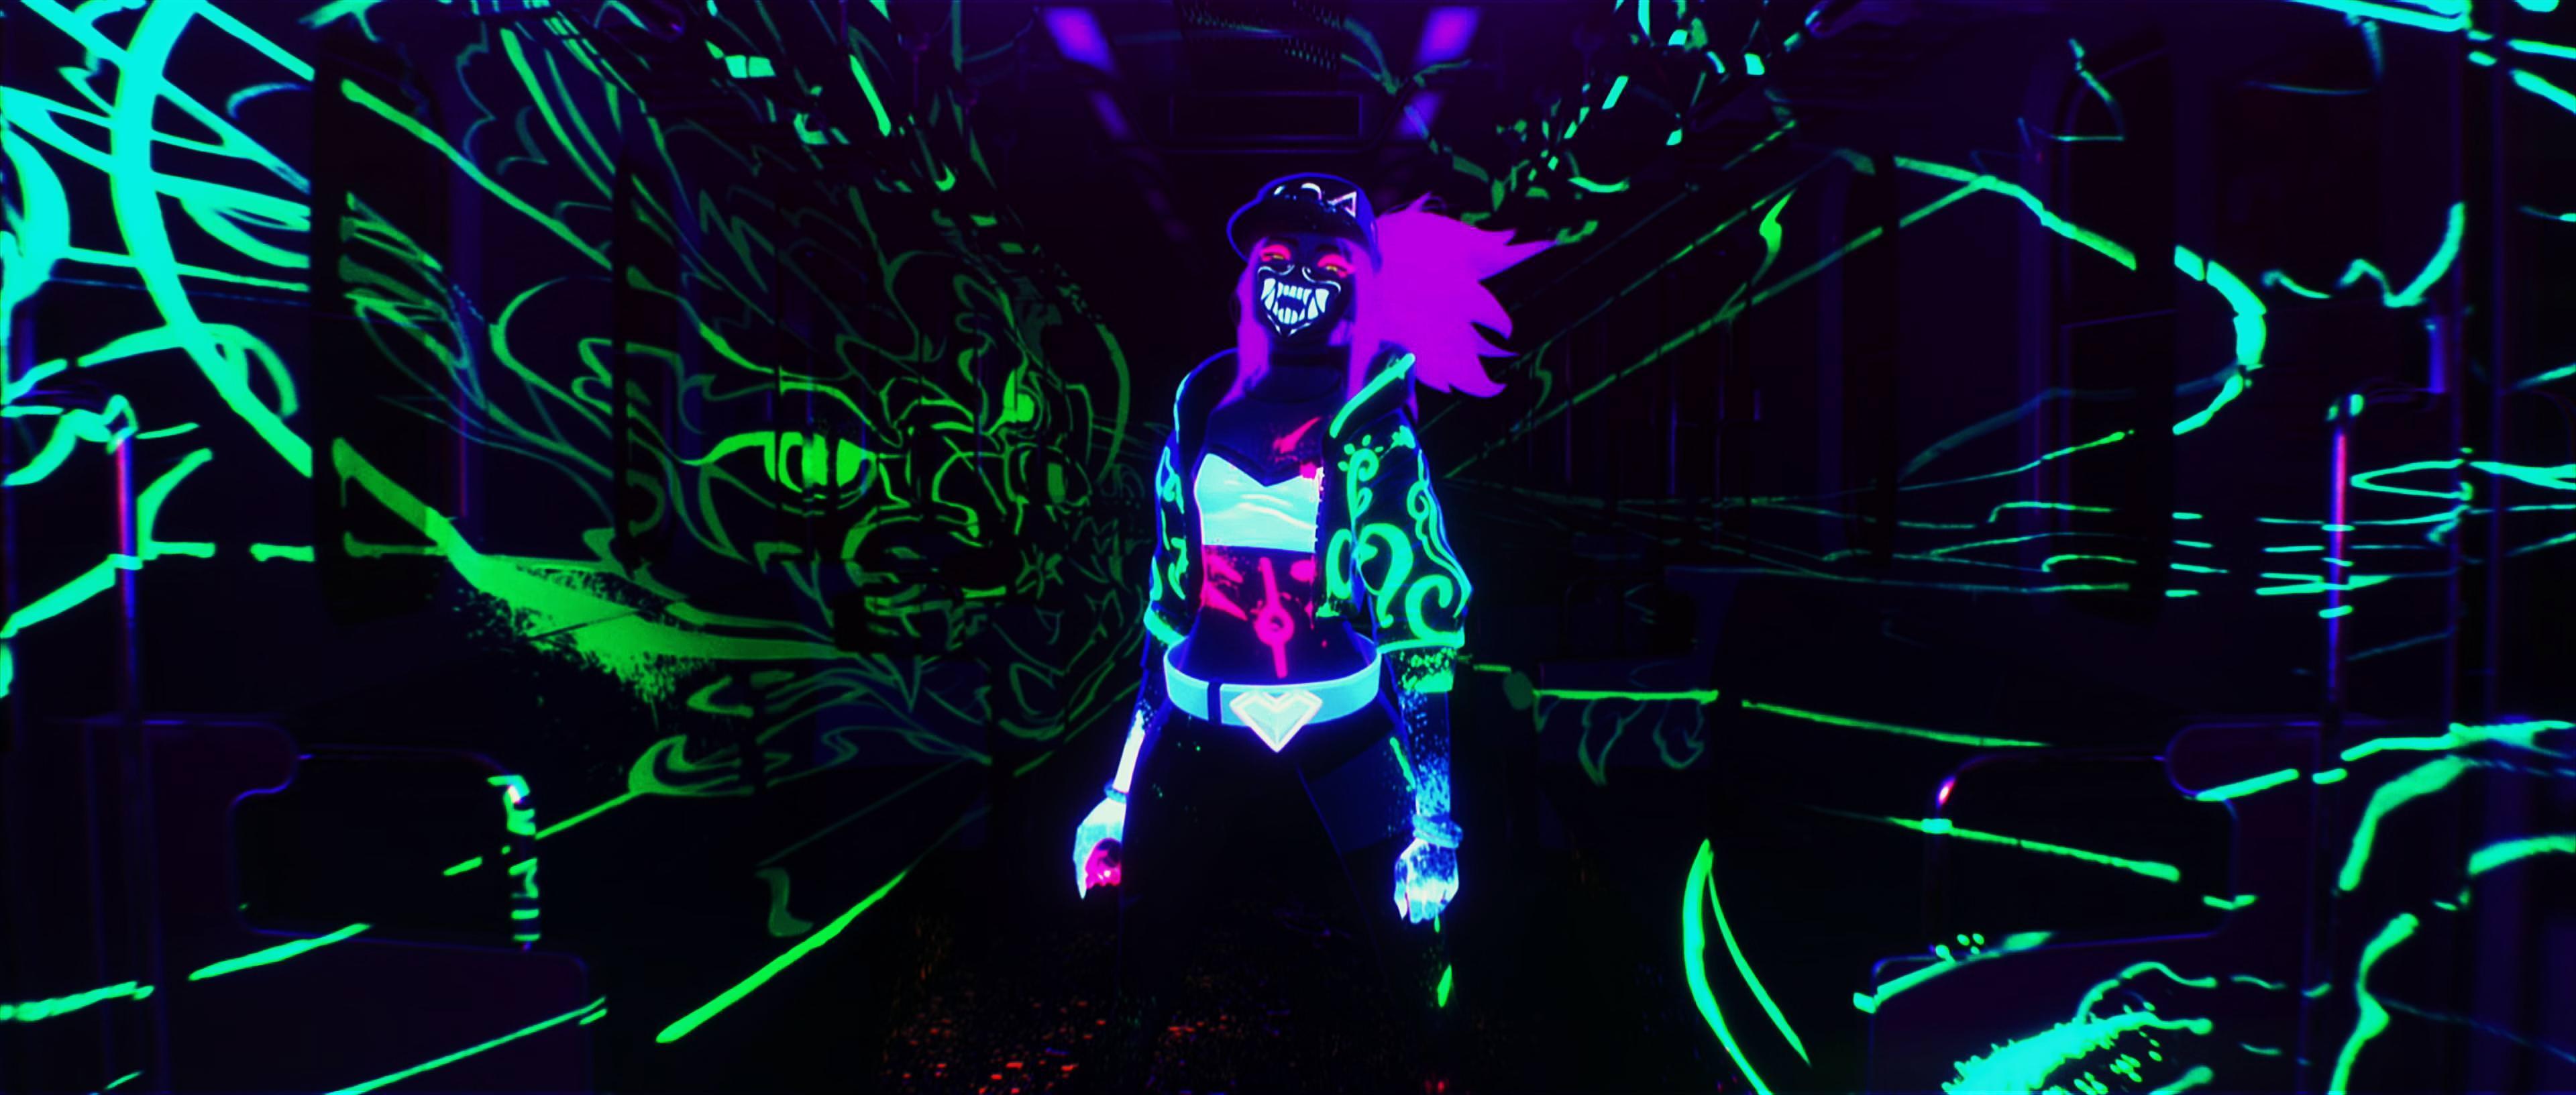 Kda Akali Neon Wallpapers Wallpaper Cave